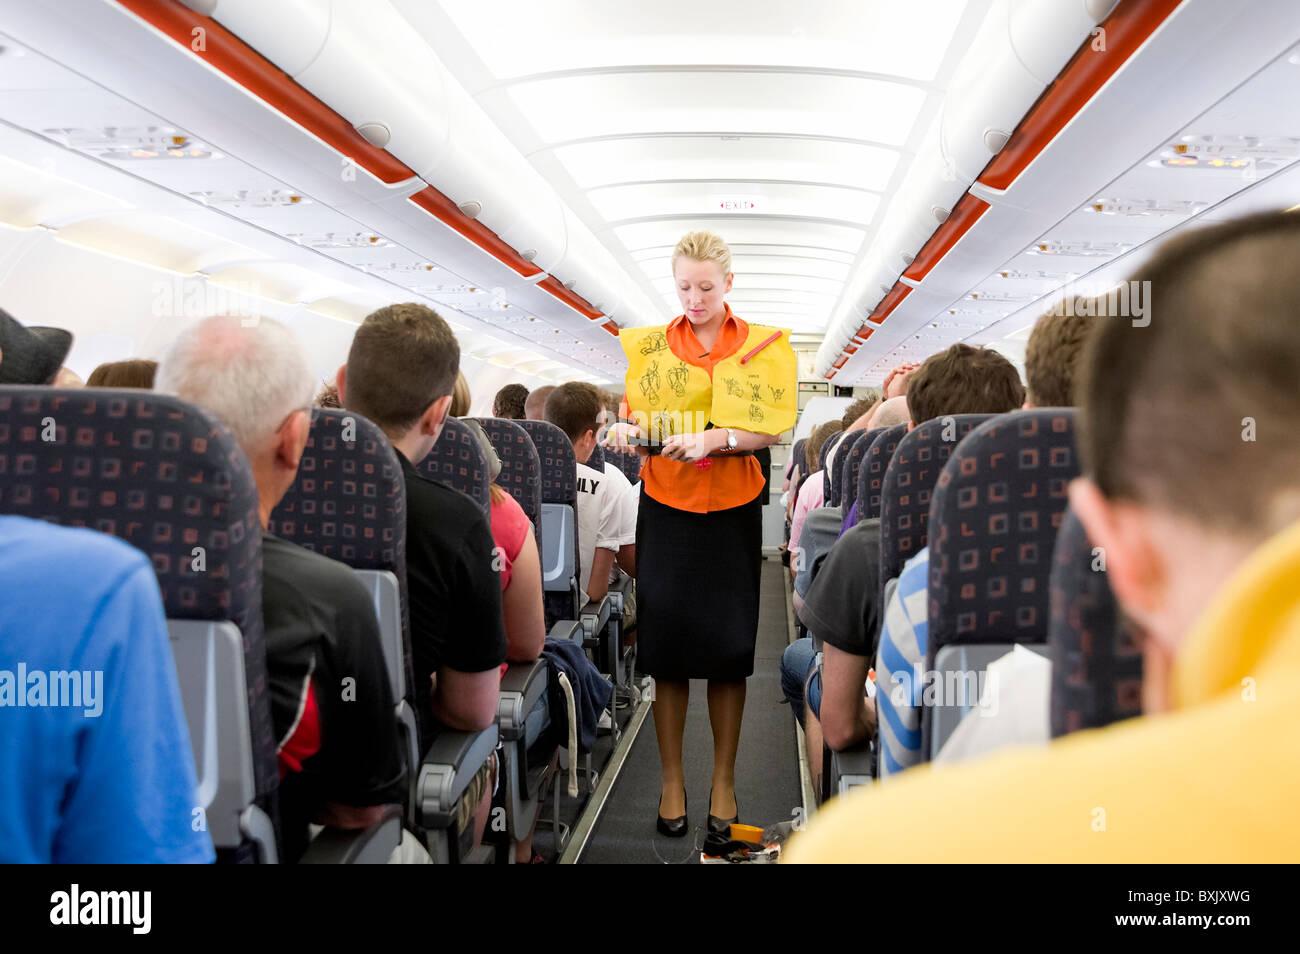 Preflight safety demonstration on board EasyJet plane, England, UK - Stock Image